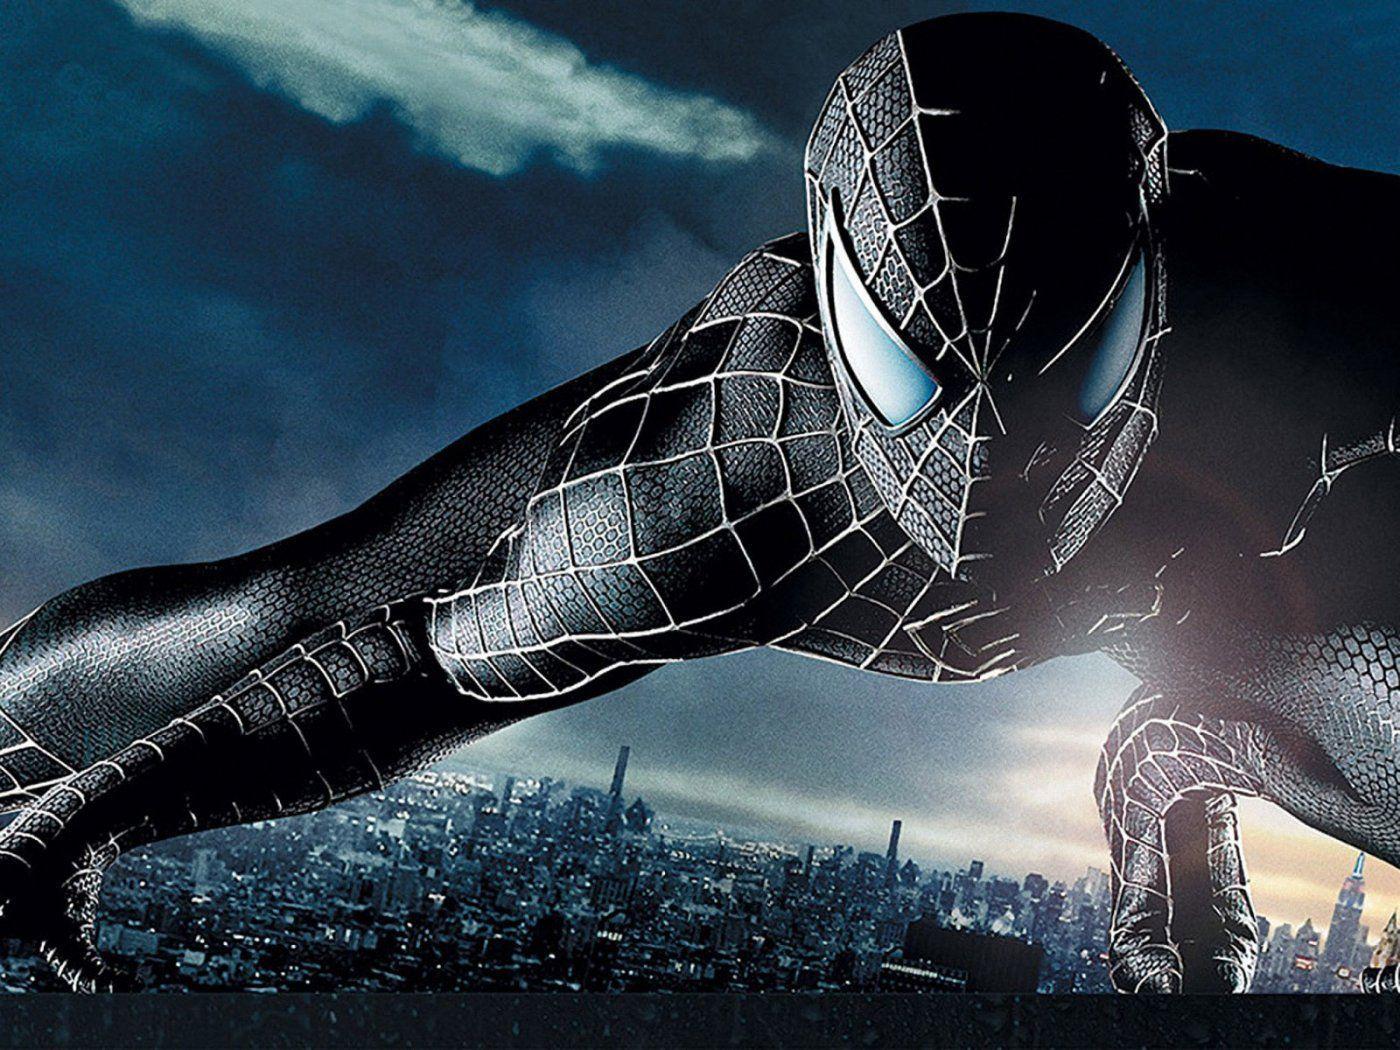 Black Spiderman Wallpaper High Definition Pzf Spiderman